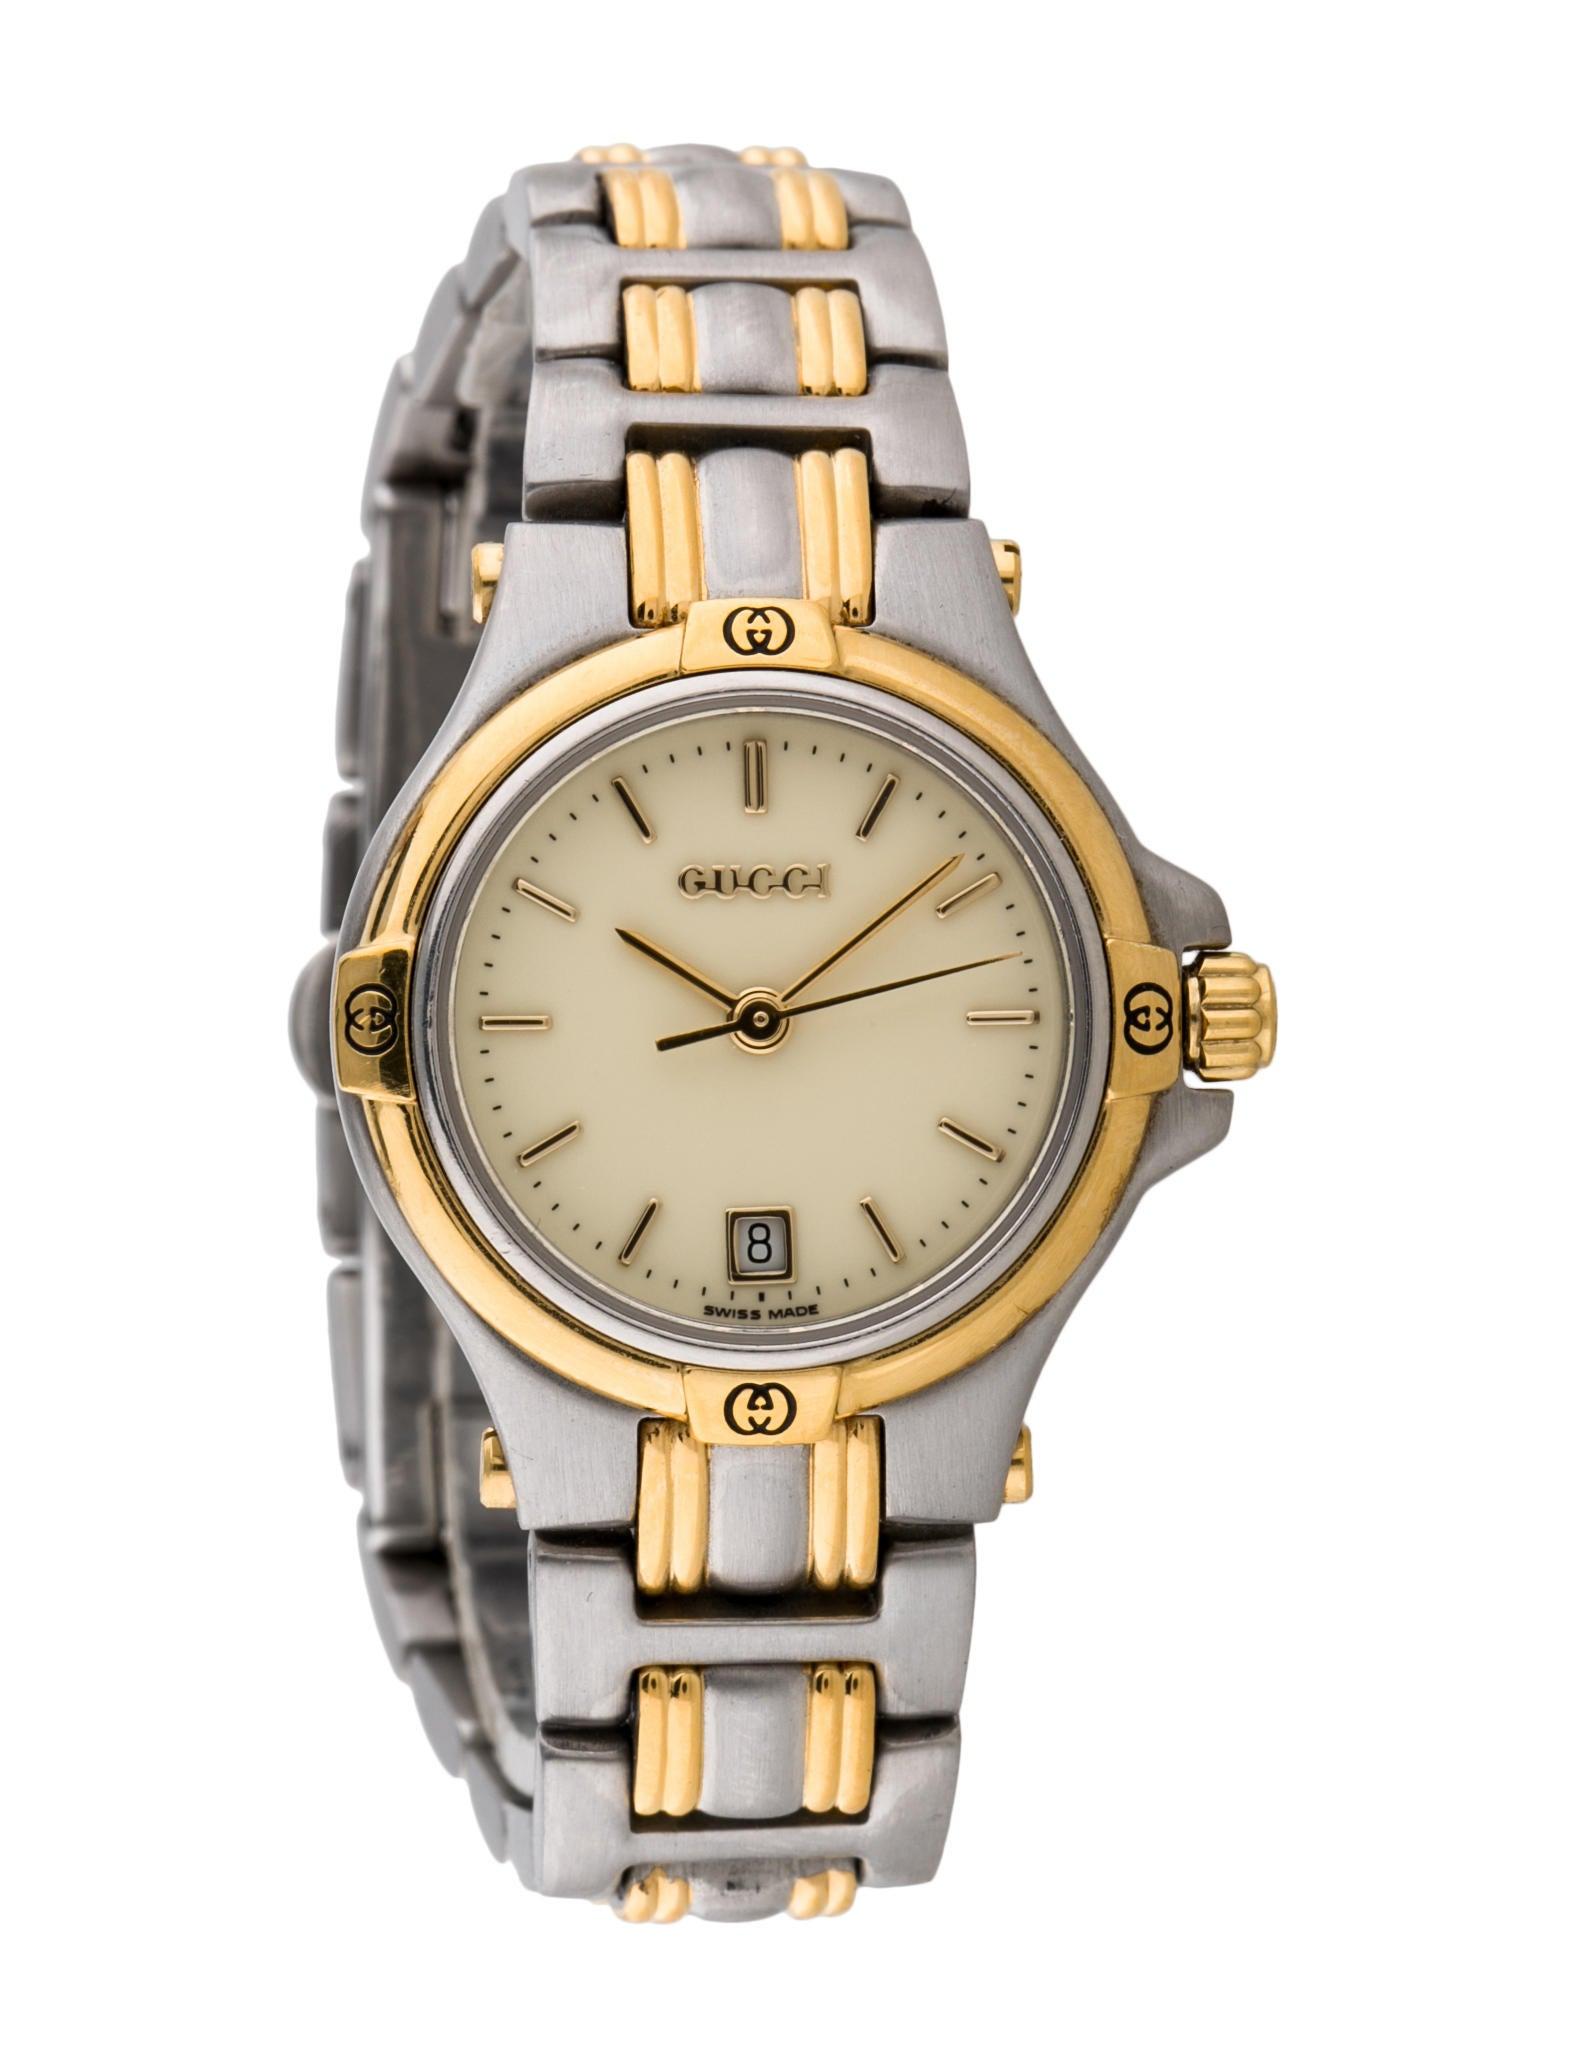 Gucci 9040L Quartz Watch - Bracelet - GUC60389 | The RealReal